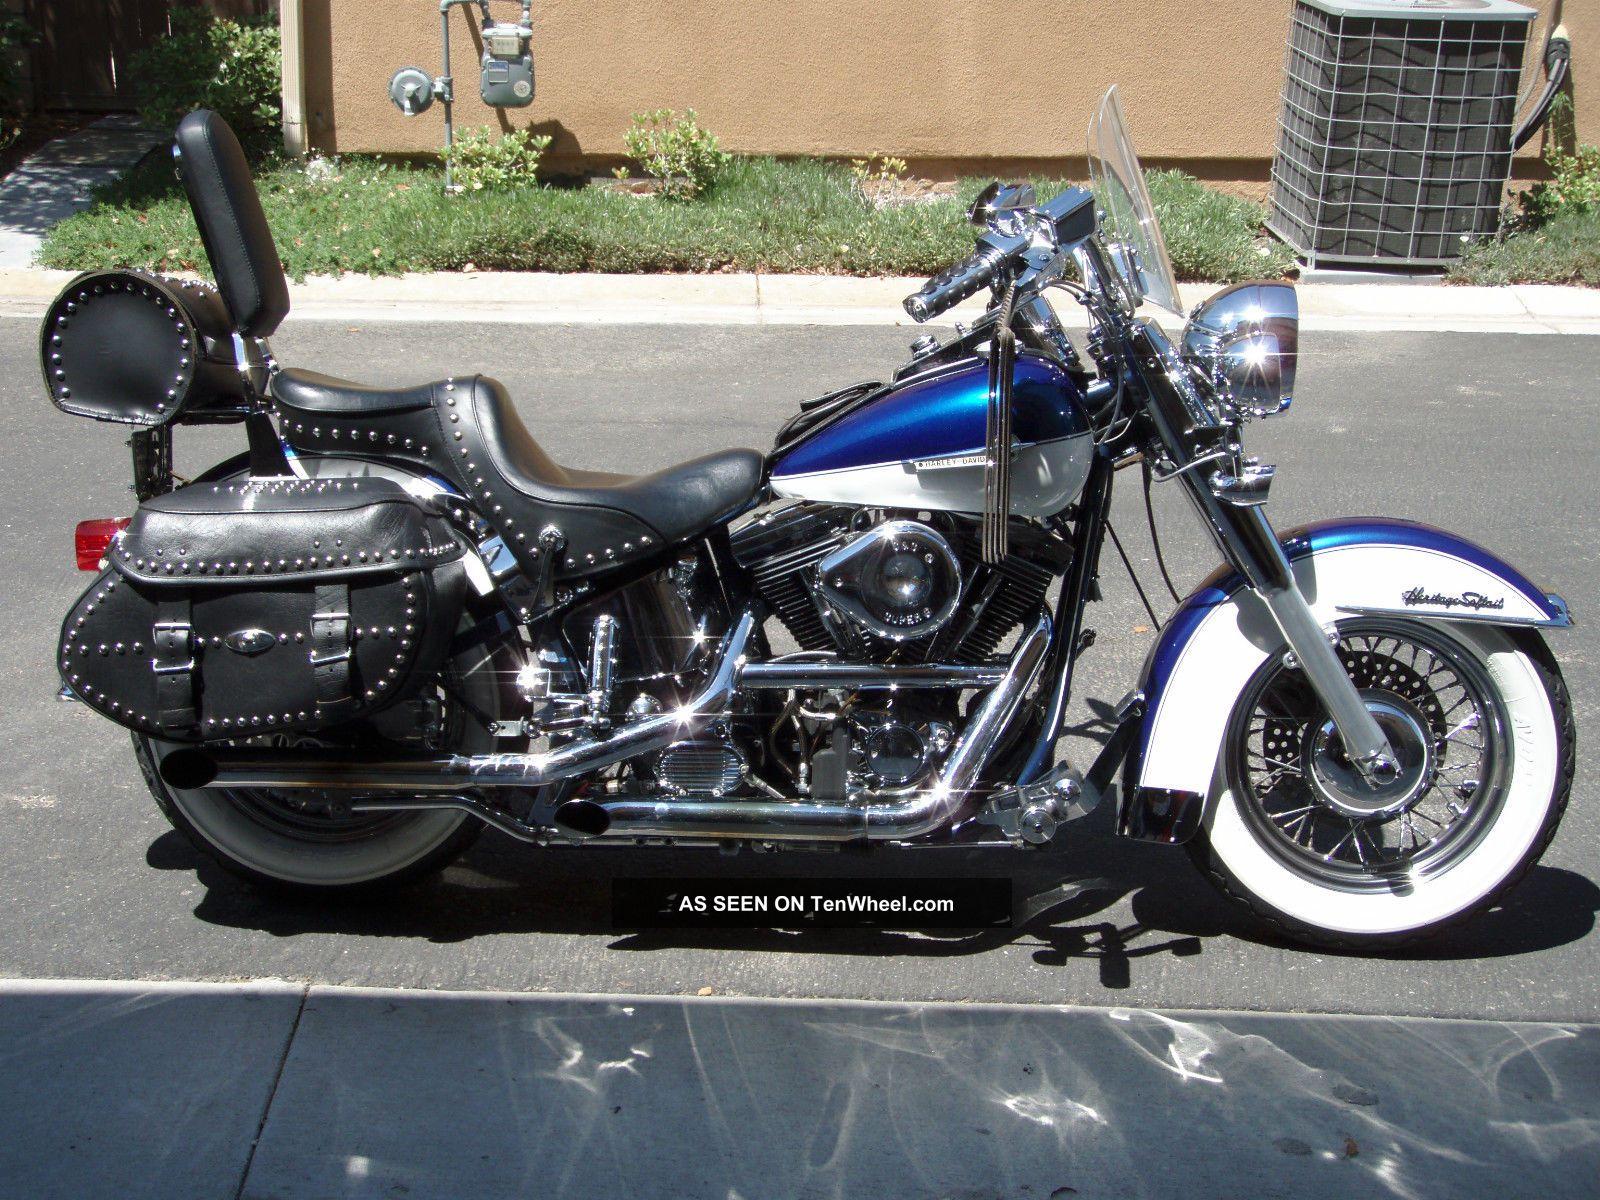 1997 Harley Davidson Heritage Softail Classic